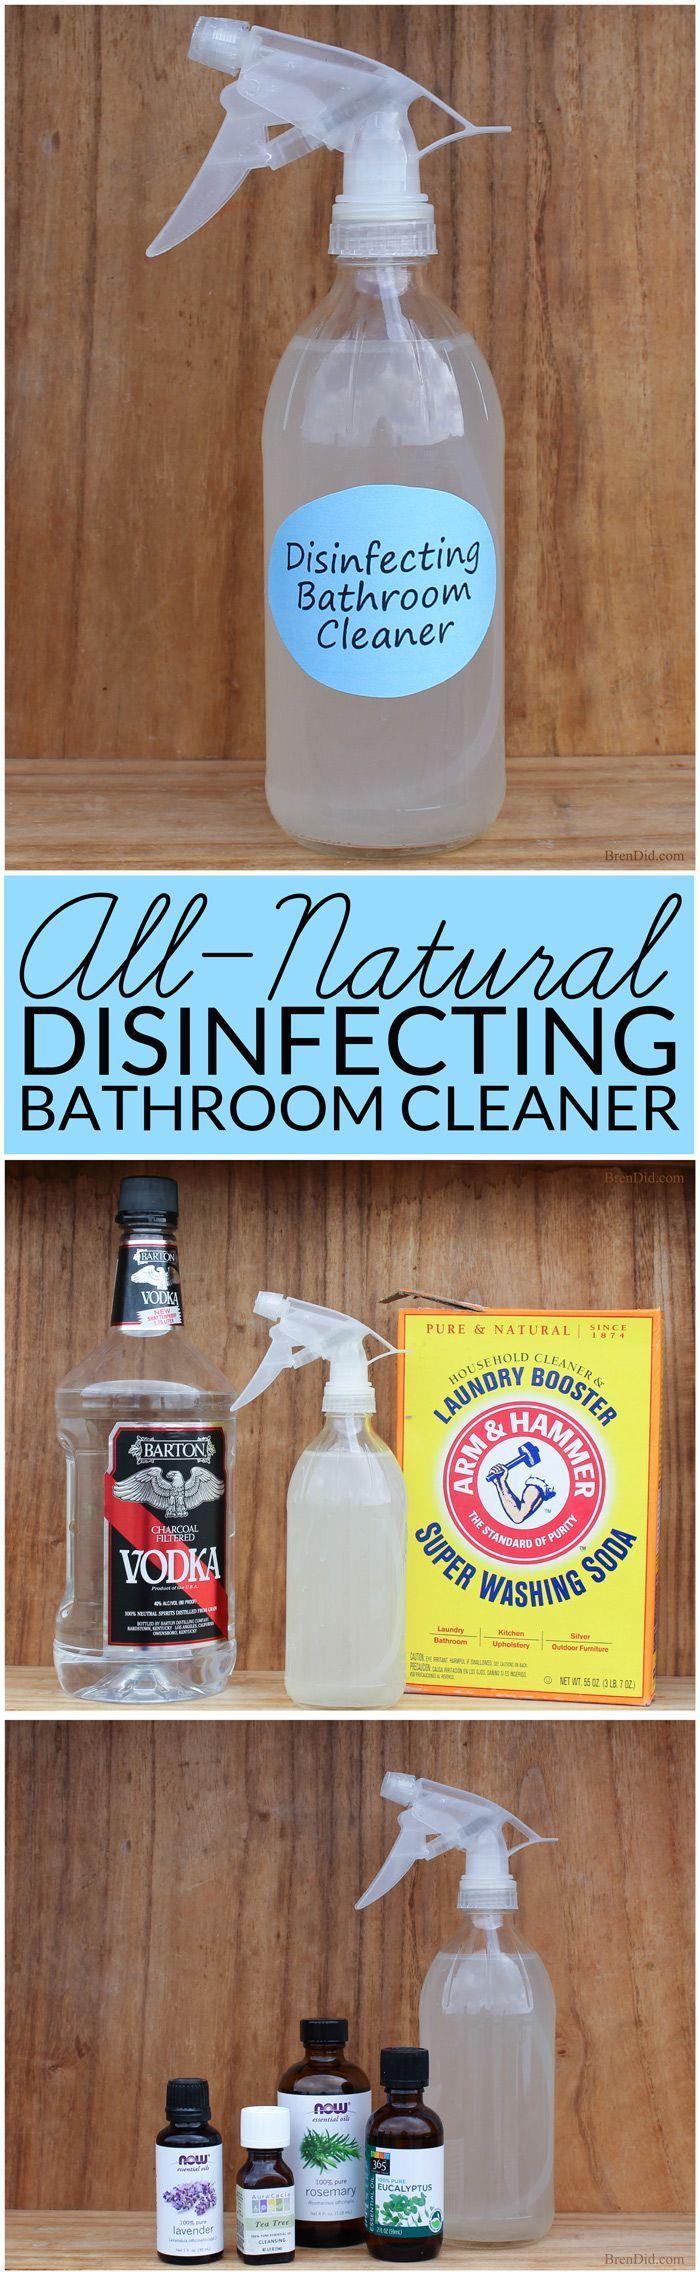 Best 25 Natural Bathroom Ideas On Pinterest Neutral Bathroom Simple Bathroom And Neutral